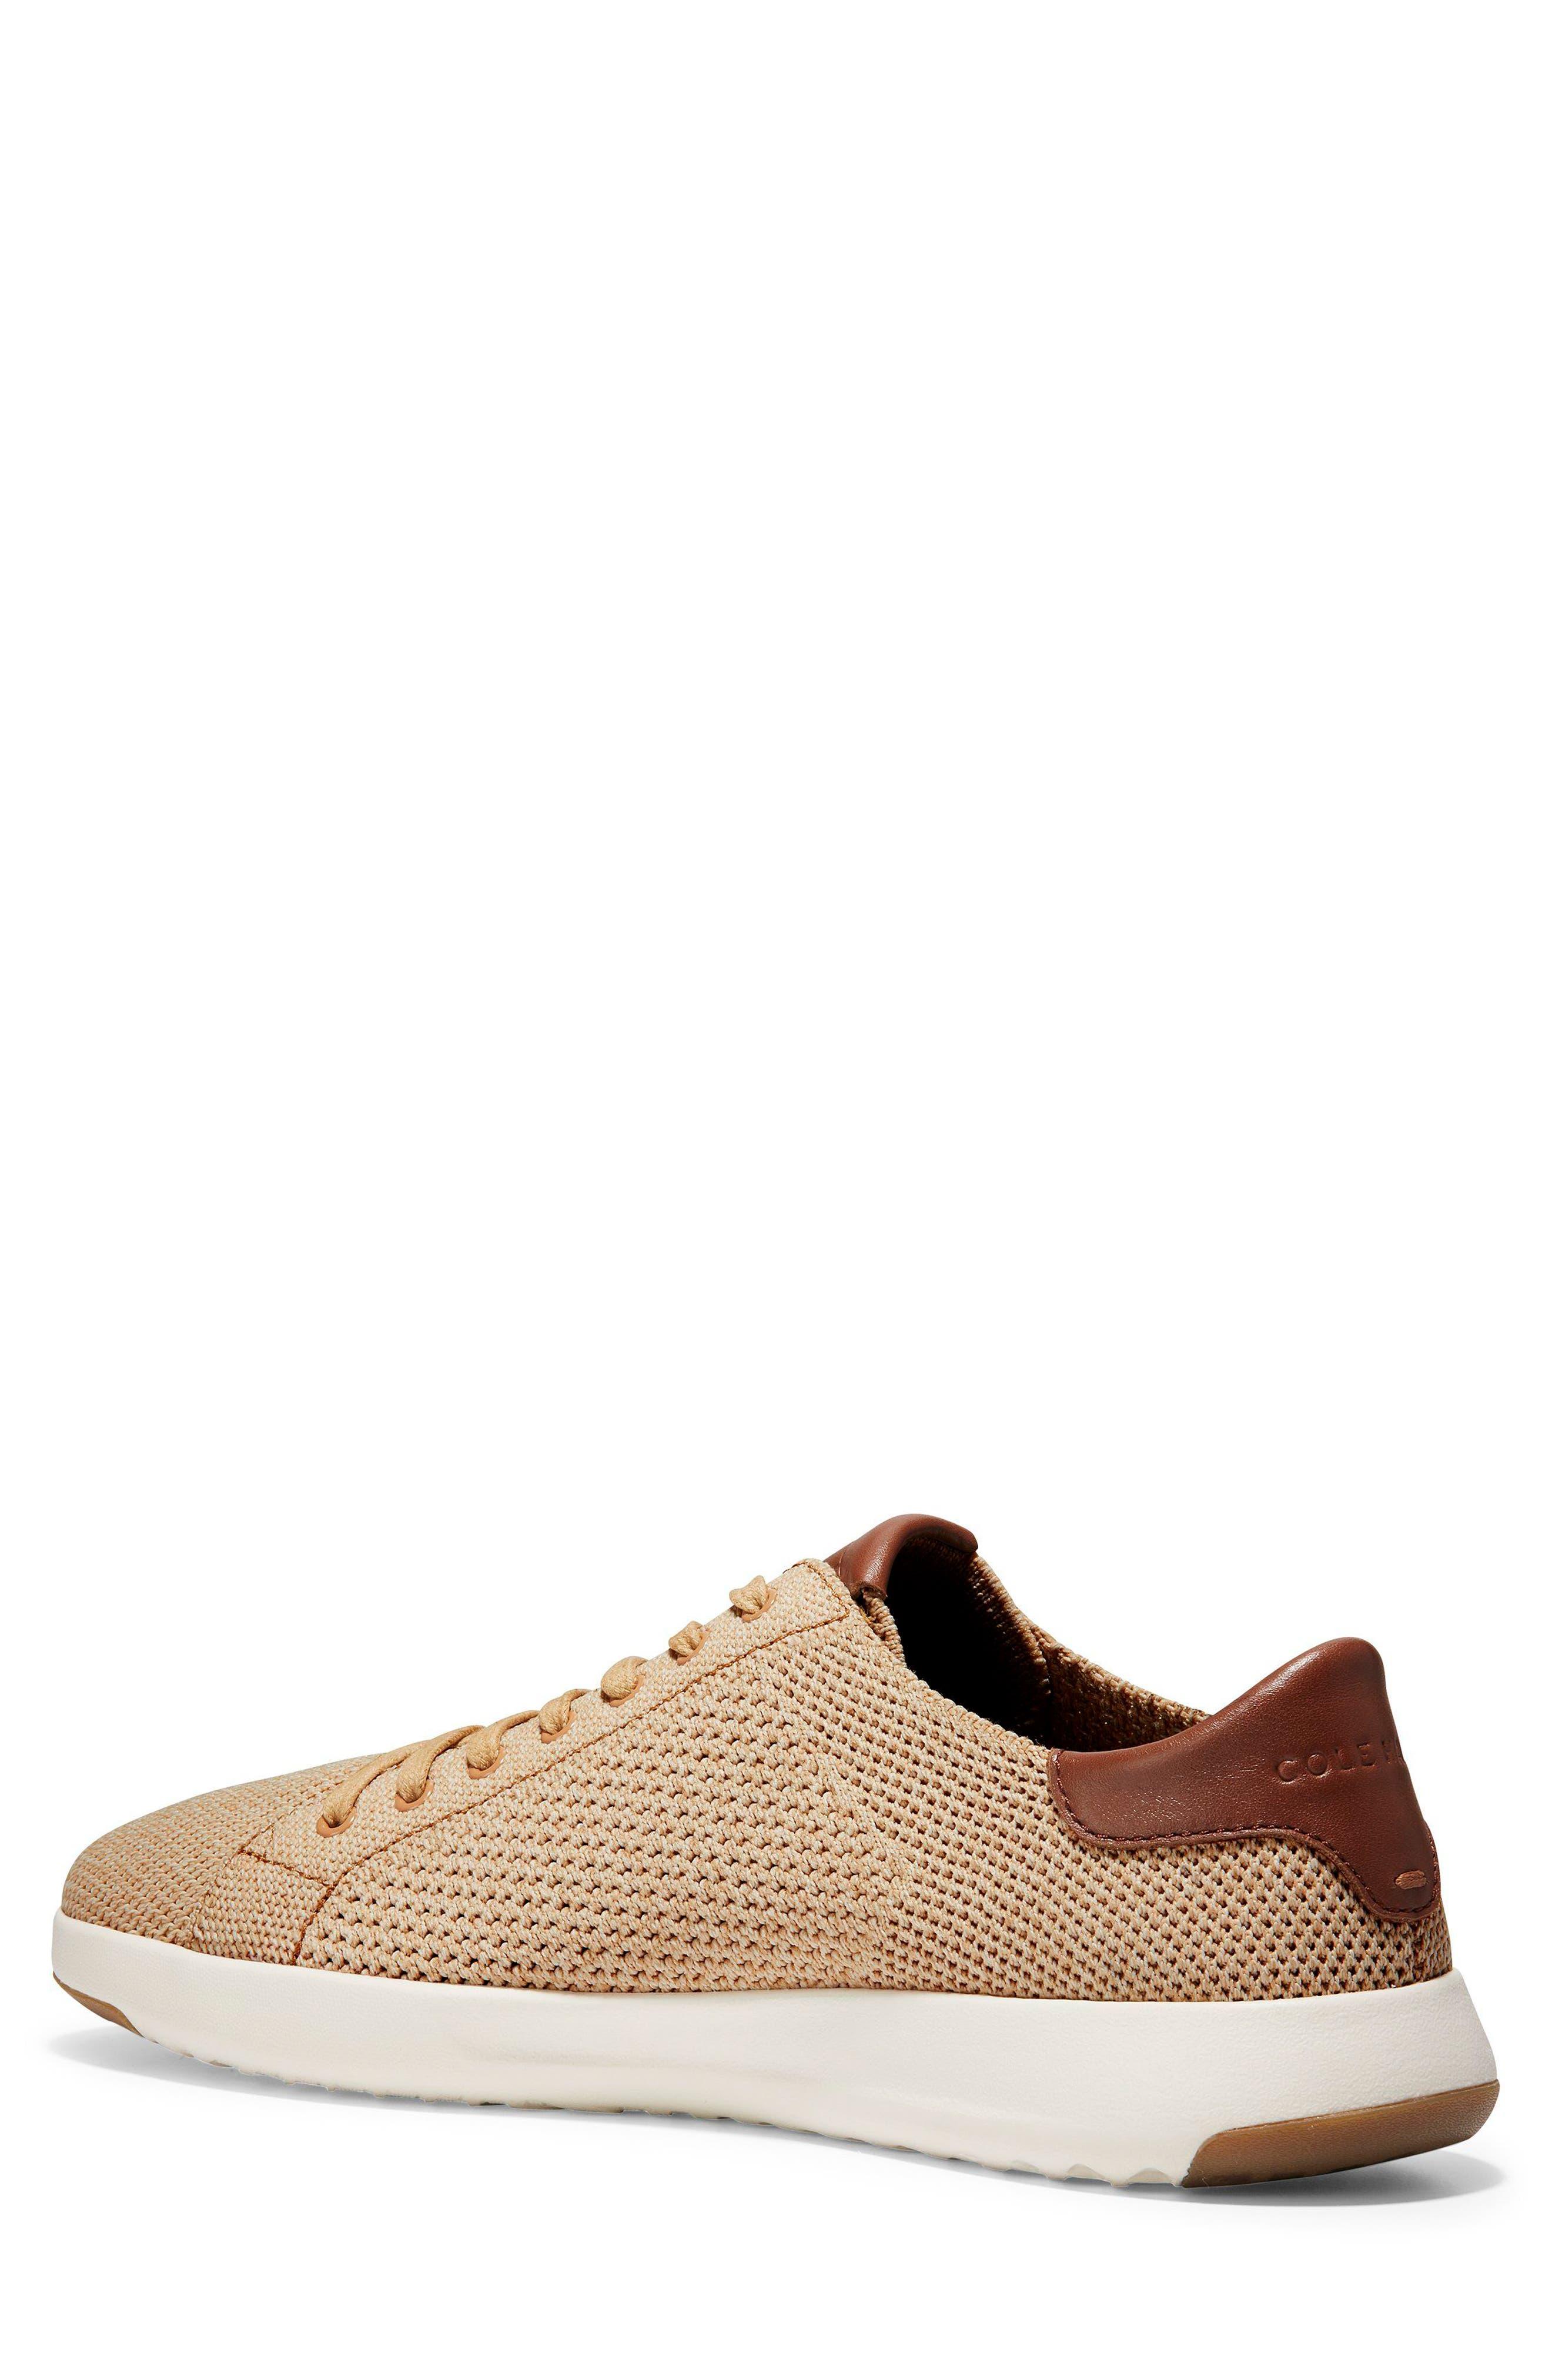 GrandPro Tennis Stitchlite Sneaker,                             Alternate thumbnail 10, color,